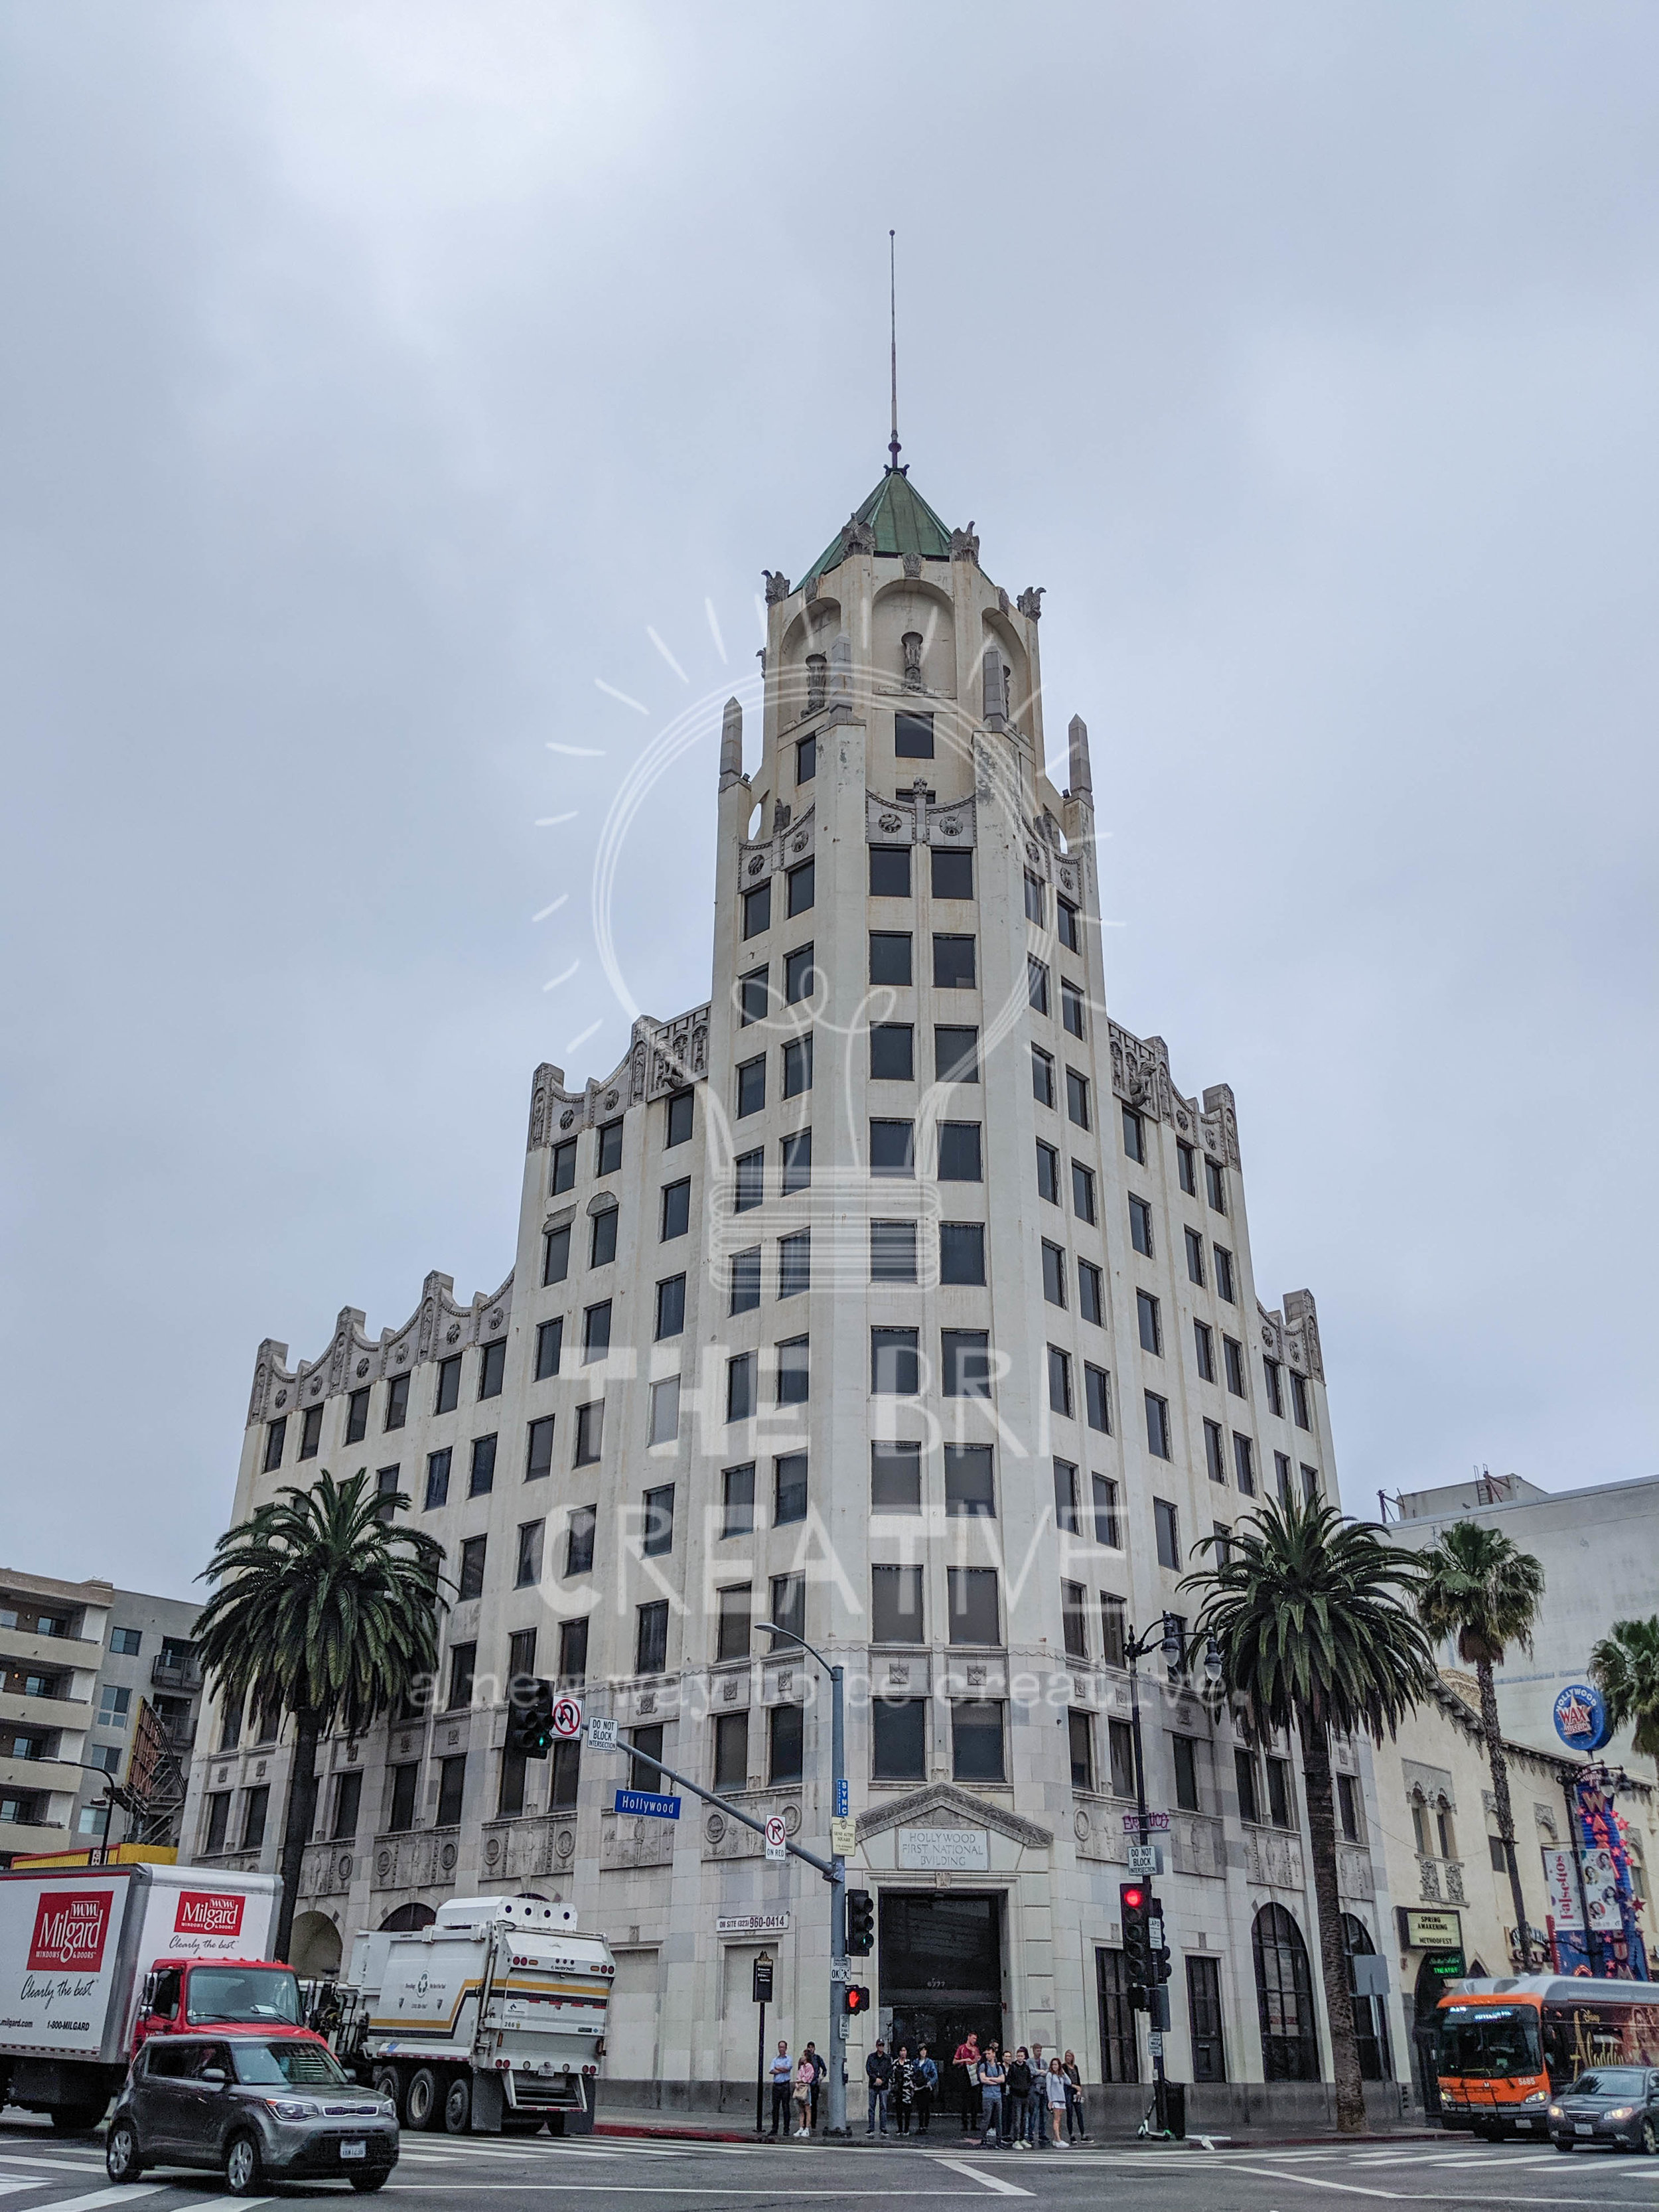 bri rinehart; adventure; california; los angeles; hollywood